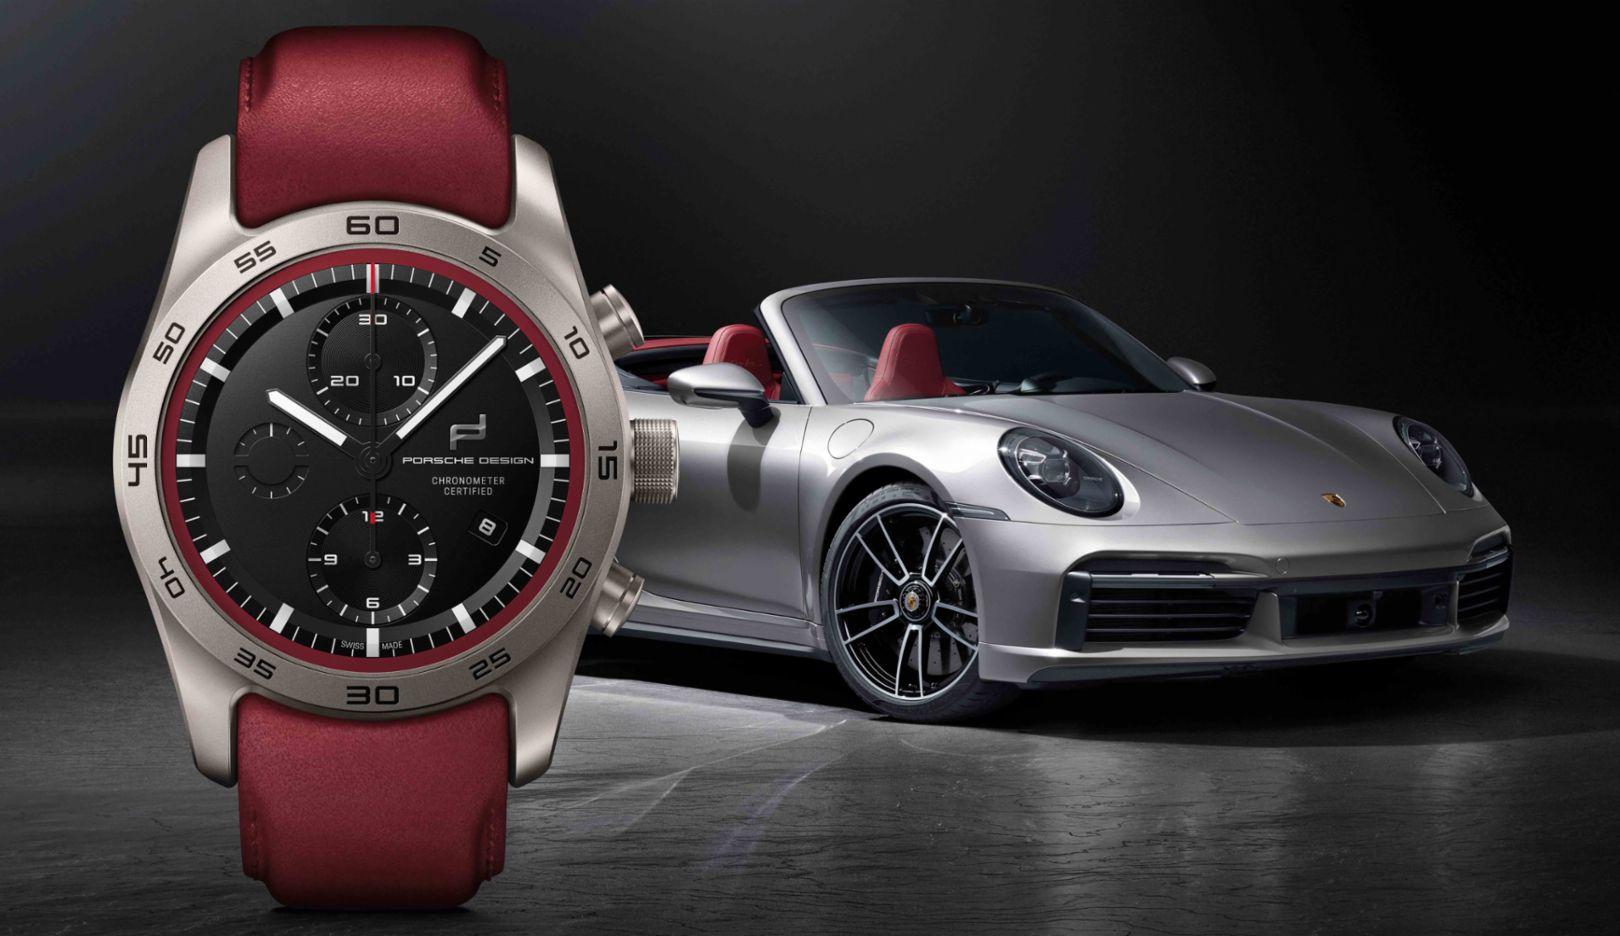 A Porsche Design chronograph designed for personal aesthetic taste - Image 8